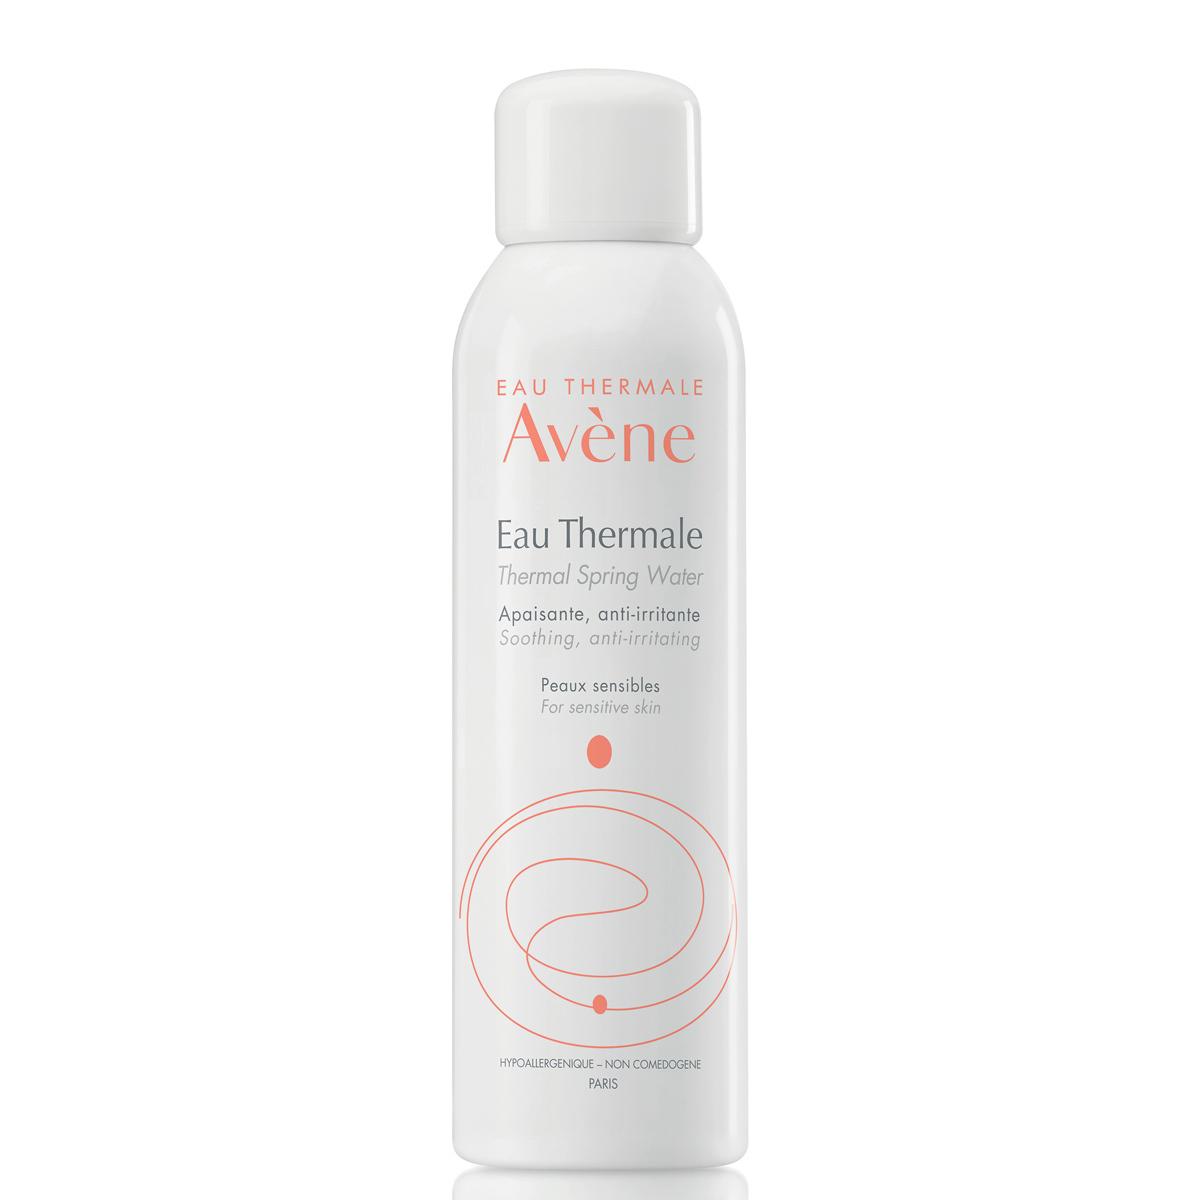 Agua termal de Avène (9,38 euros).